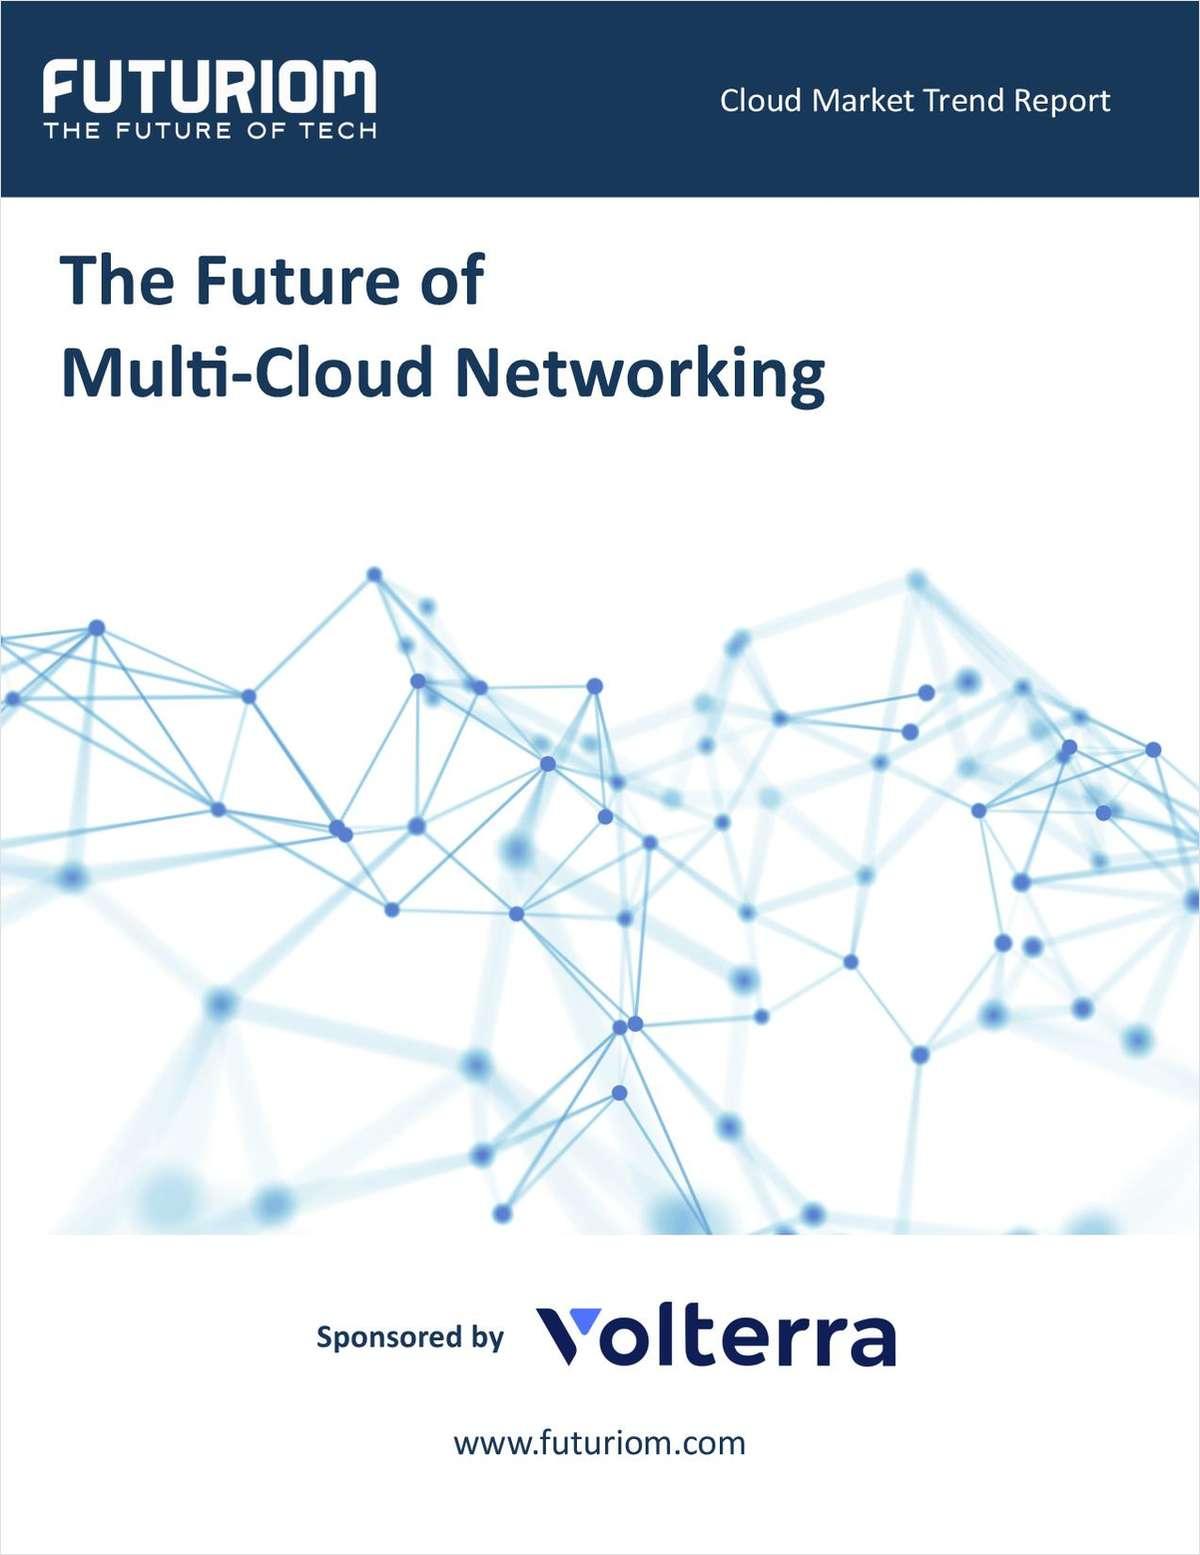 Futuriom: The Future of MultiCloud Networking